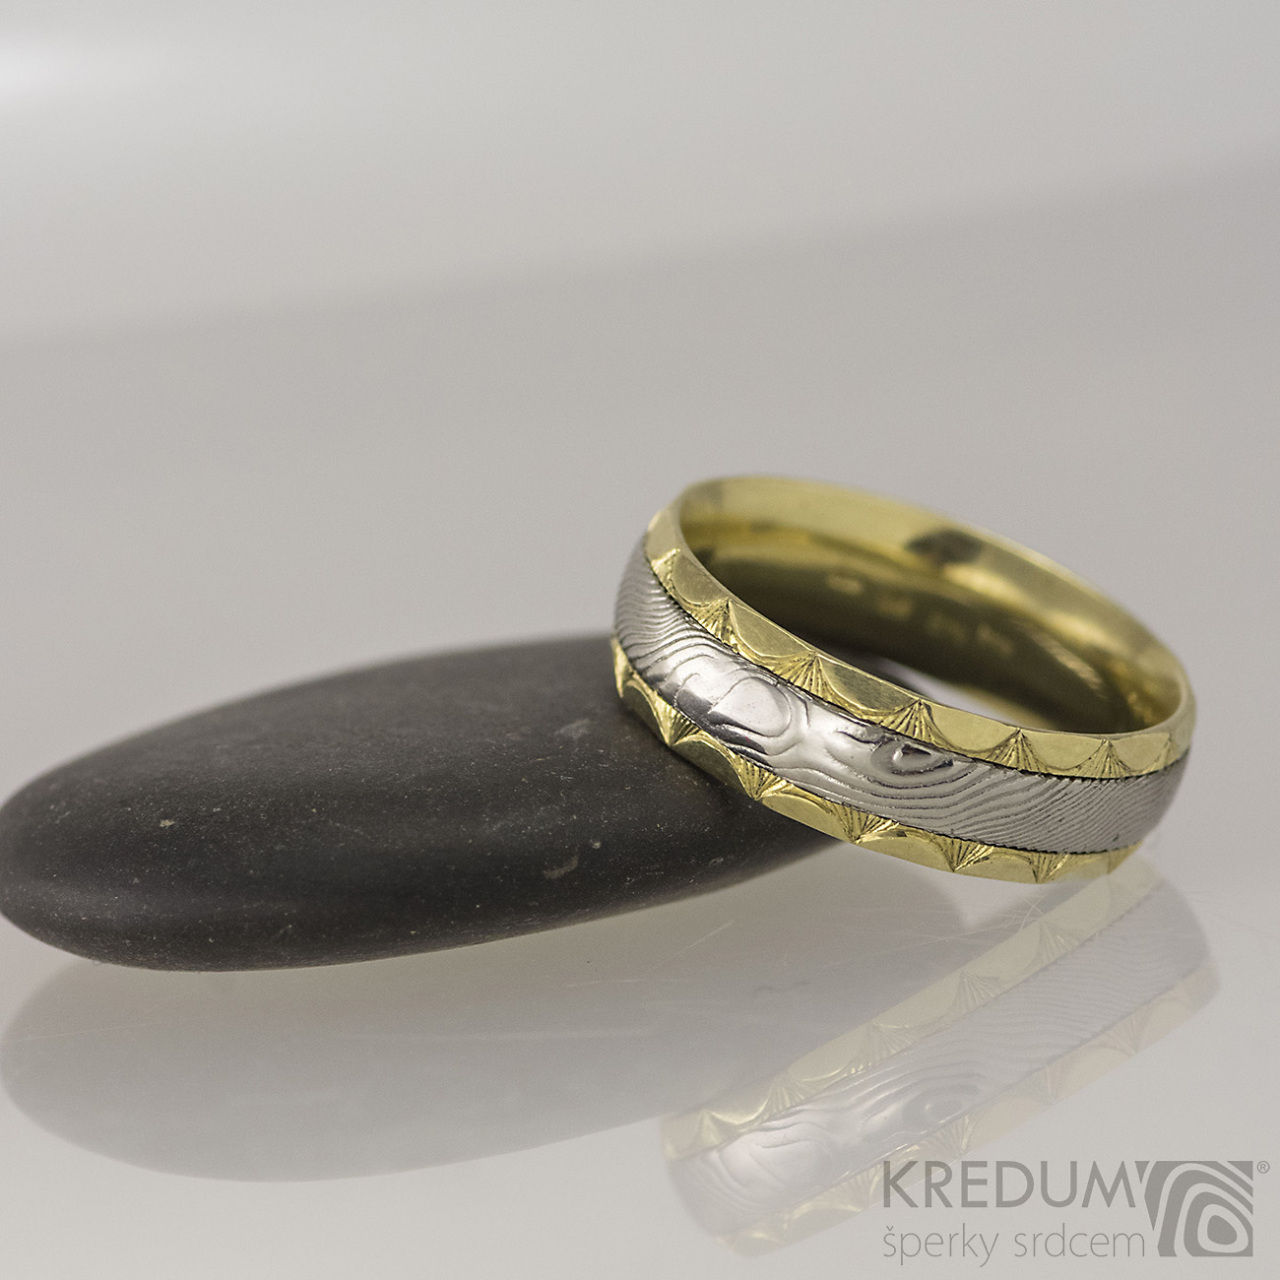 Kasiopea Engravius Drevo Zlate Snubni Prsteny A Damasteel S1668